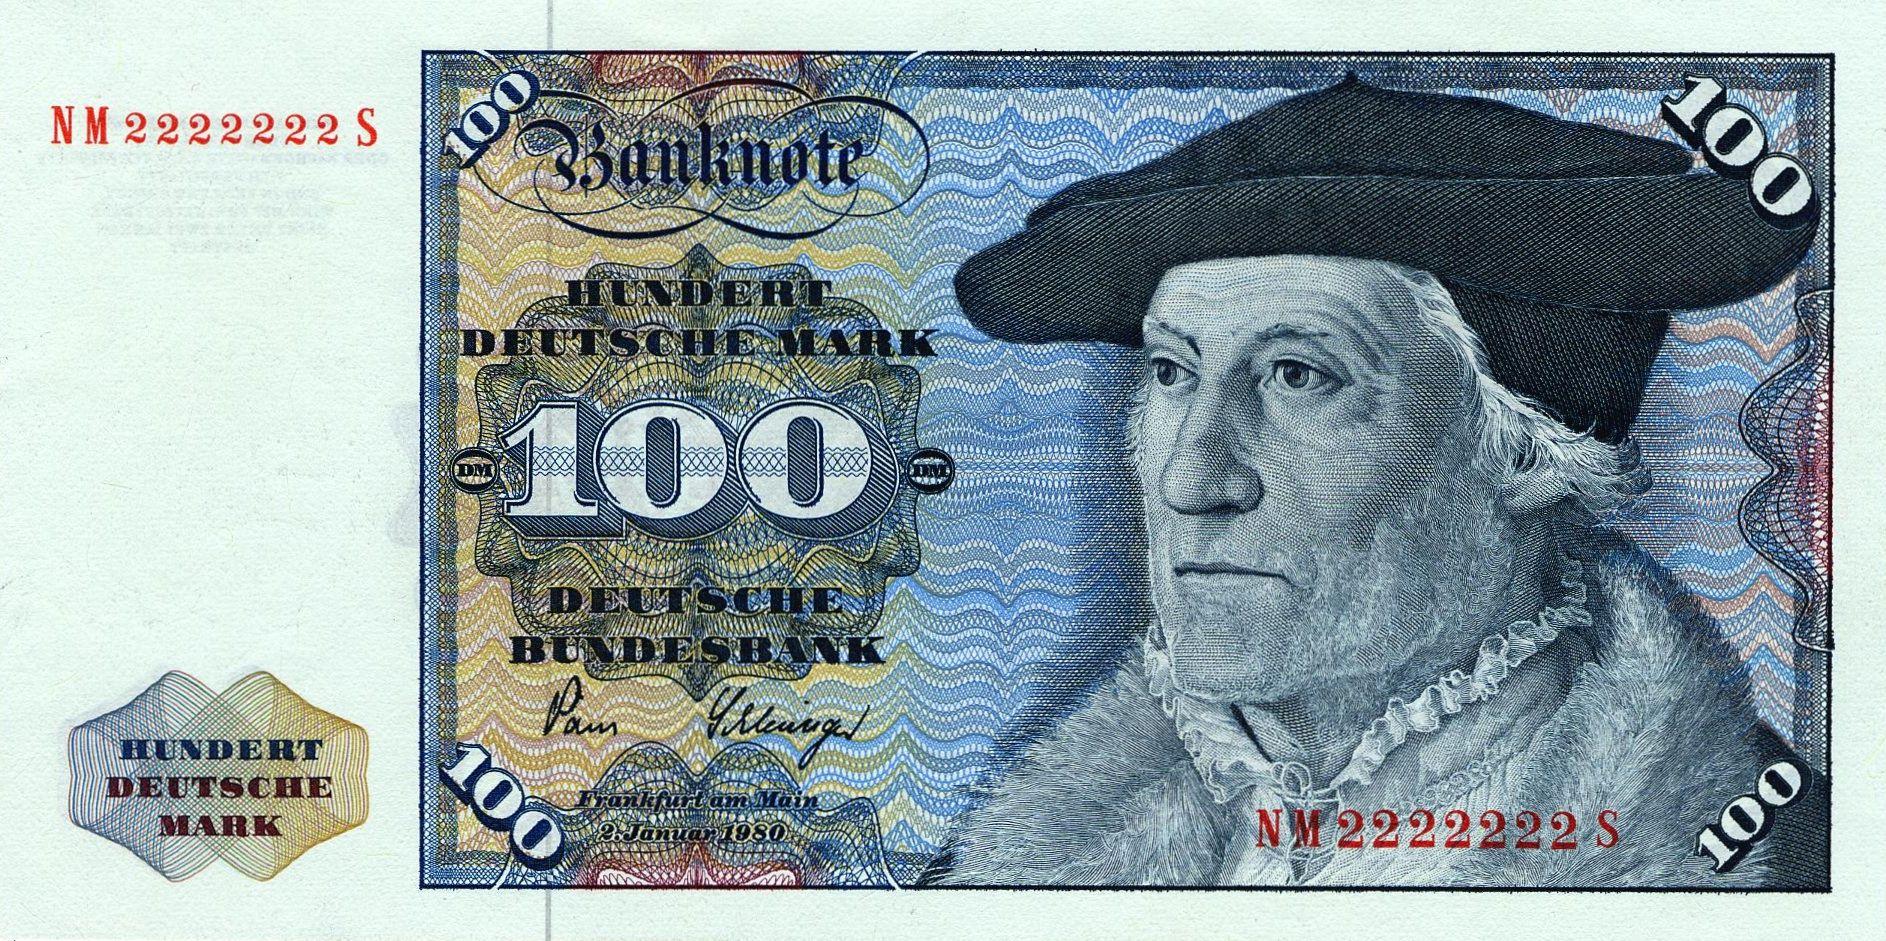 Deutsche Mark 紙幣